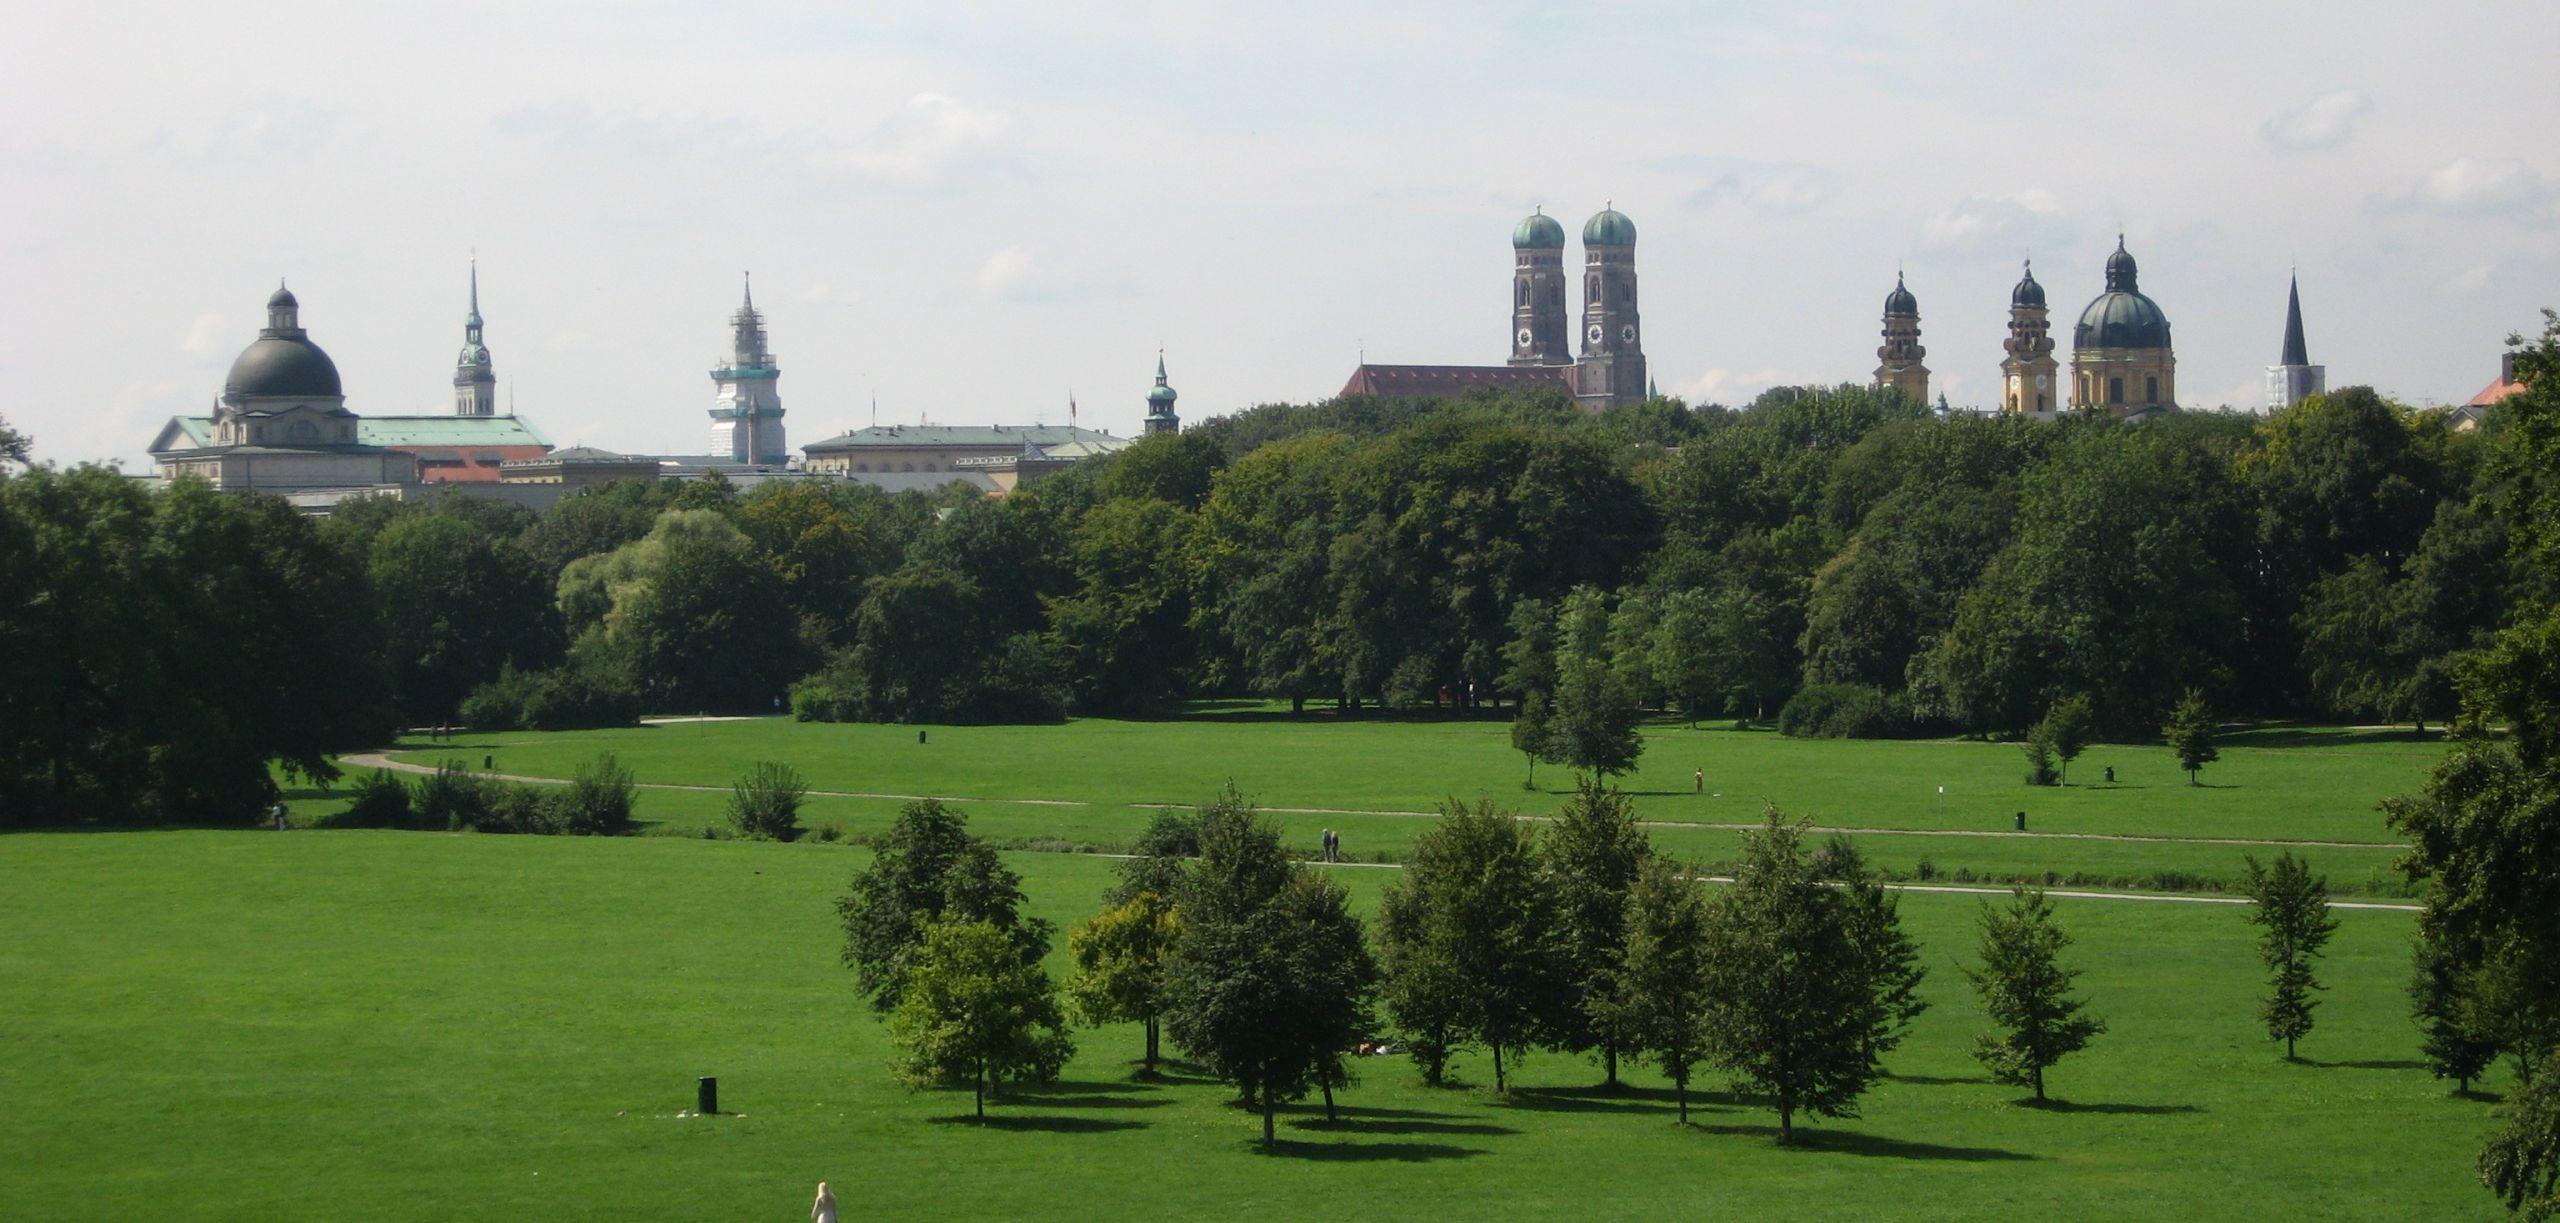 Englischer Garten from Monopteros JPG